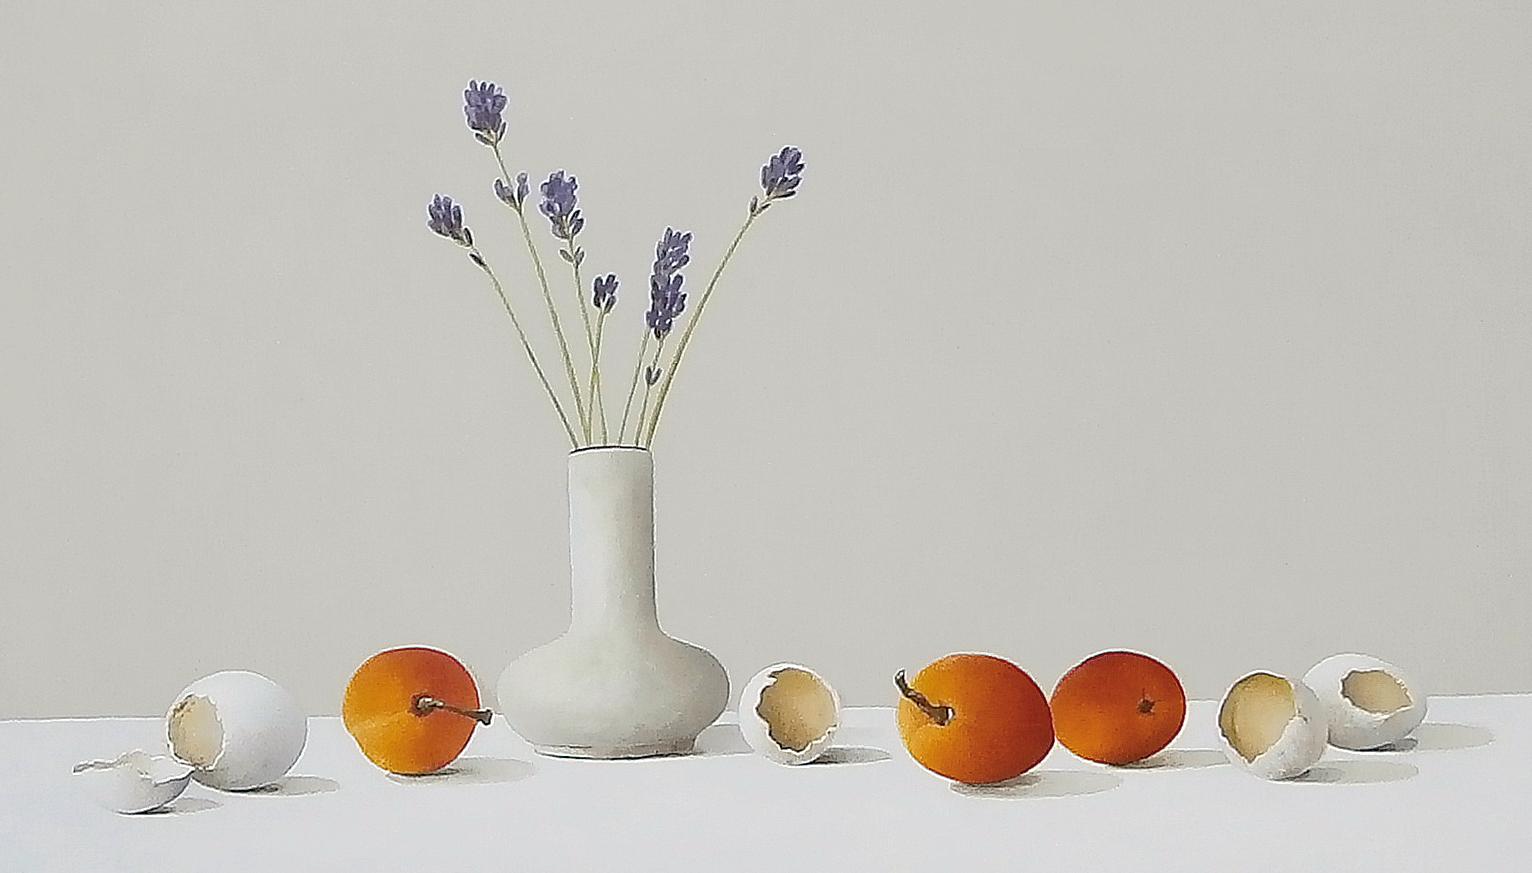 abrikozen en eitjes